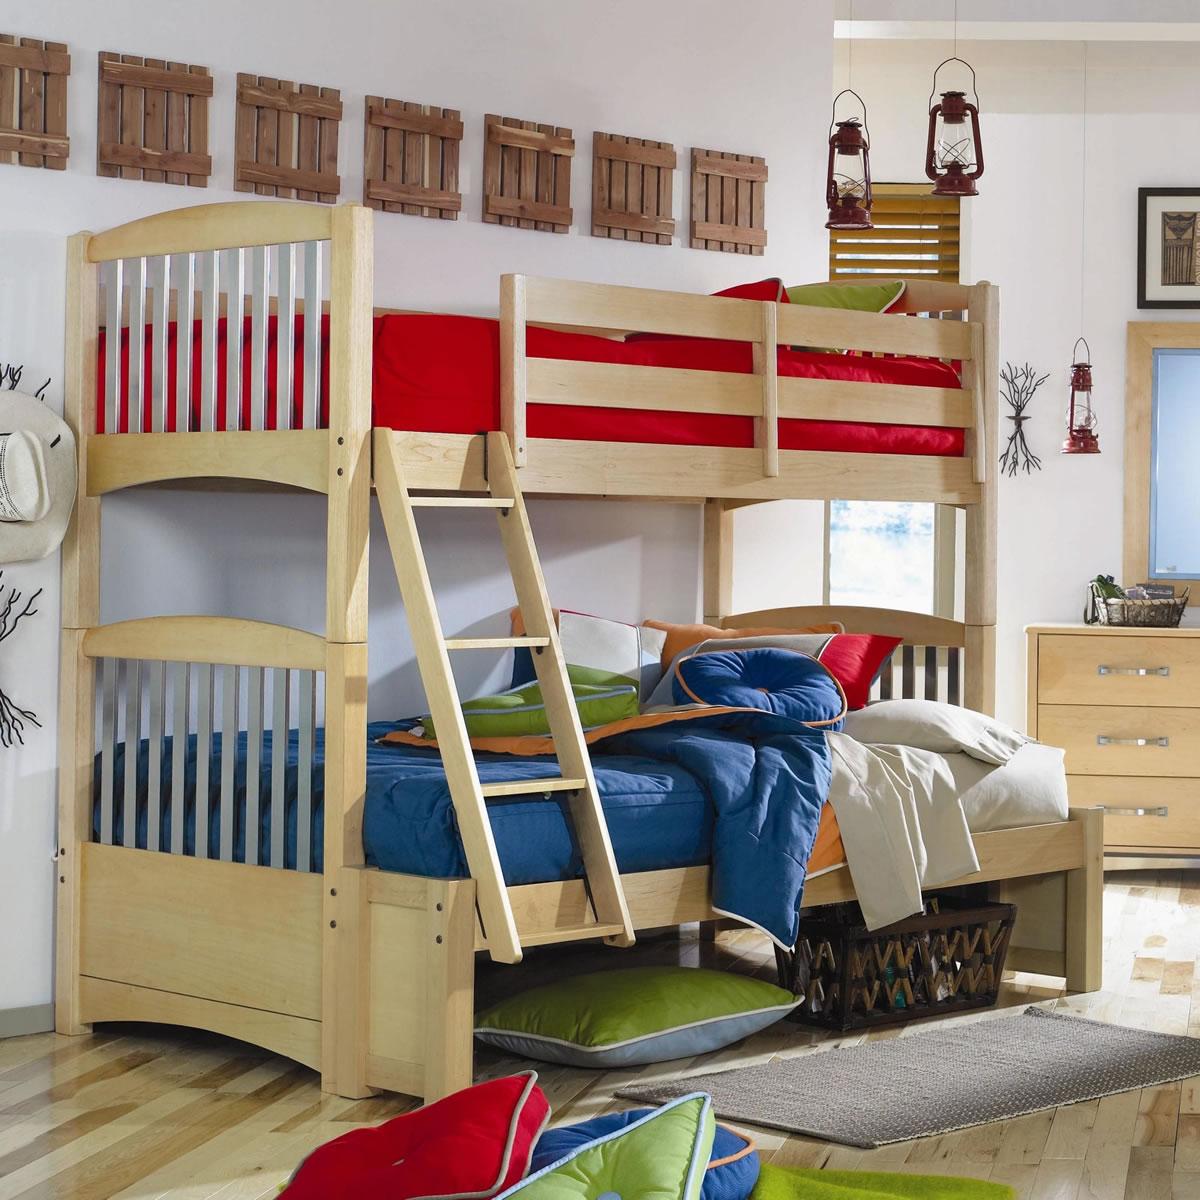 lea furniture iroom bunk bed